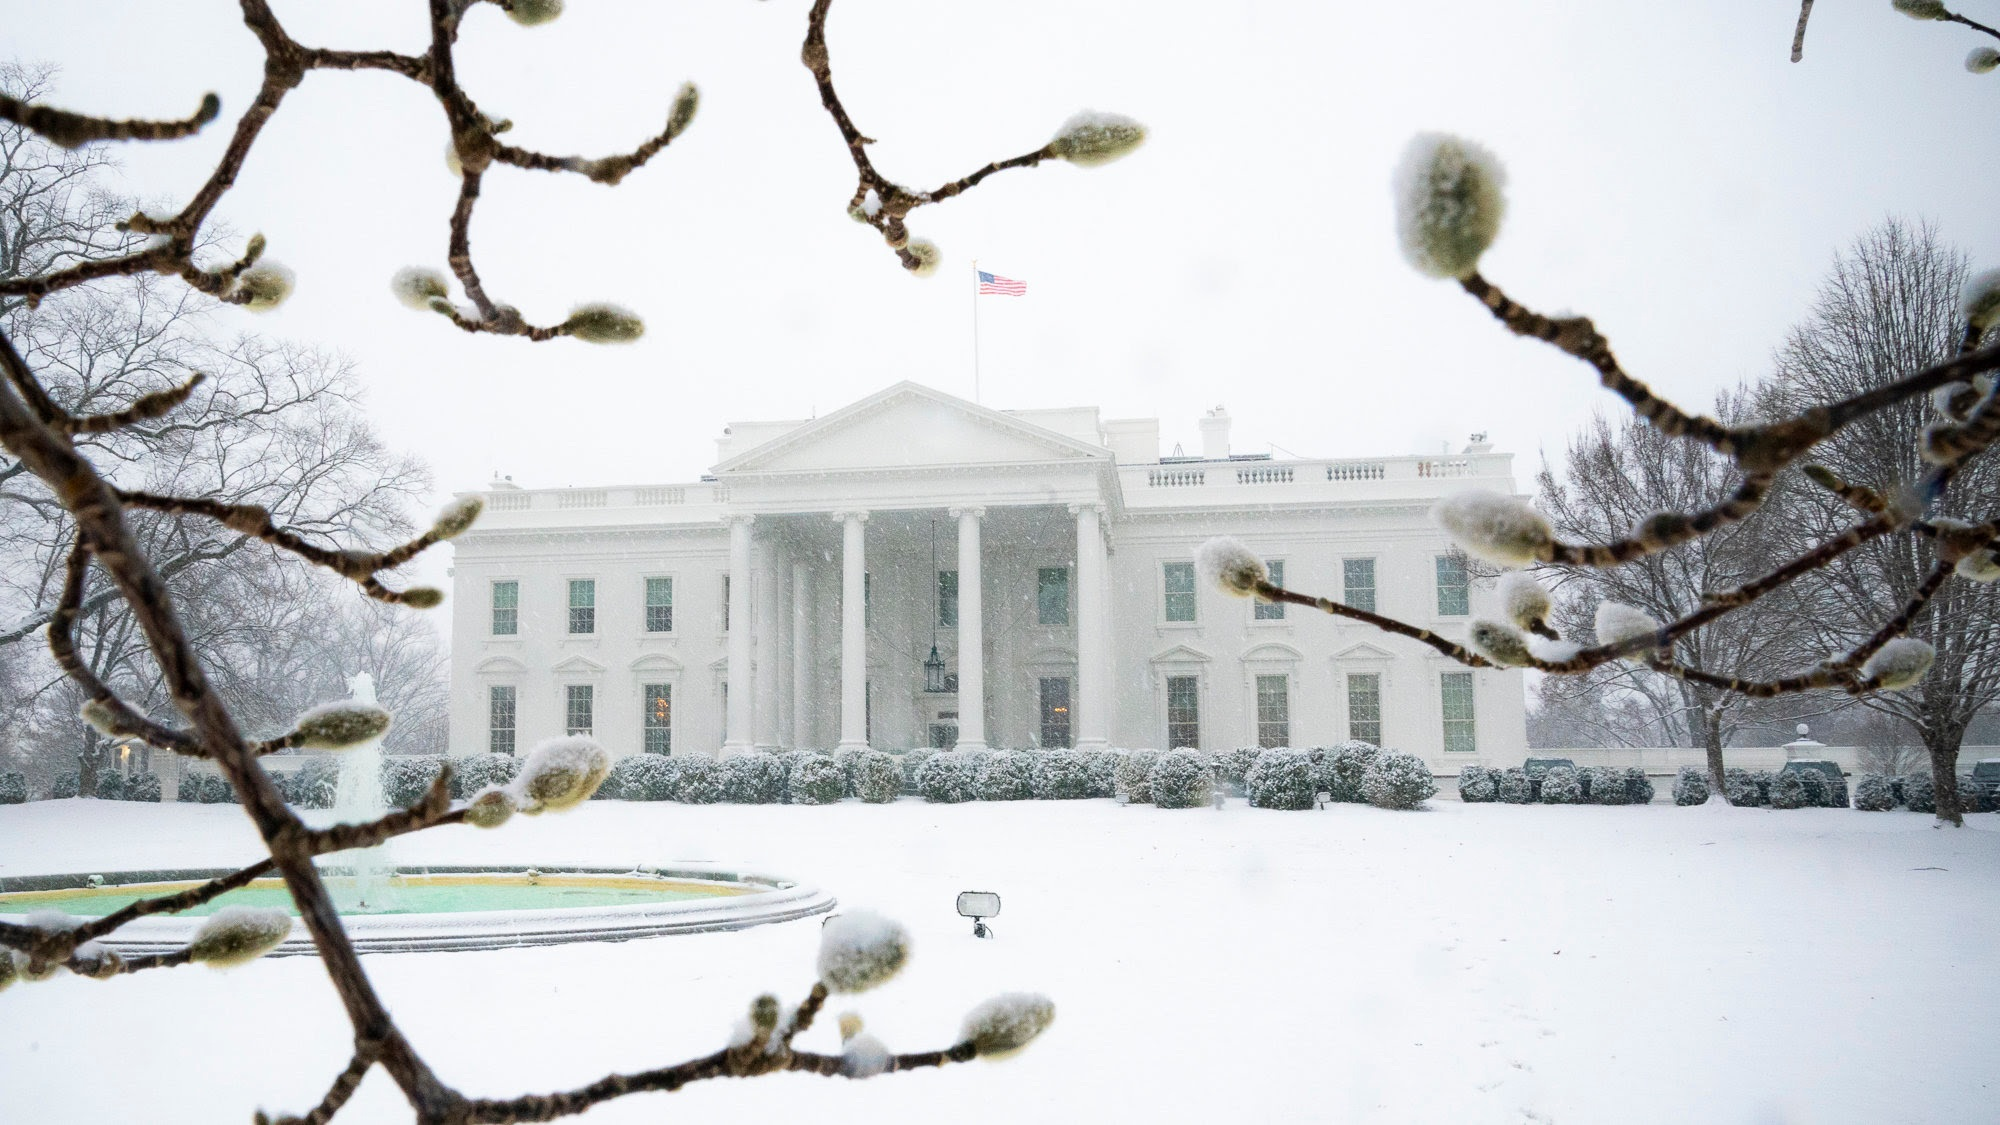 2019-02-20 - White House photo.jpg